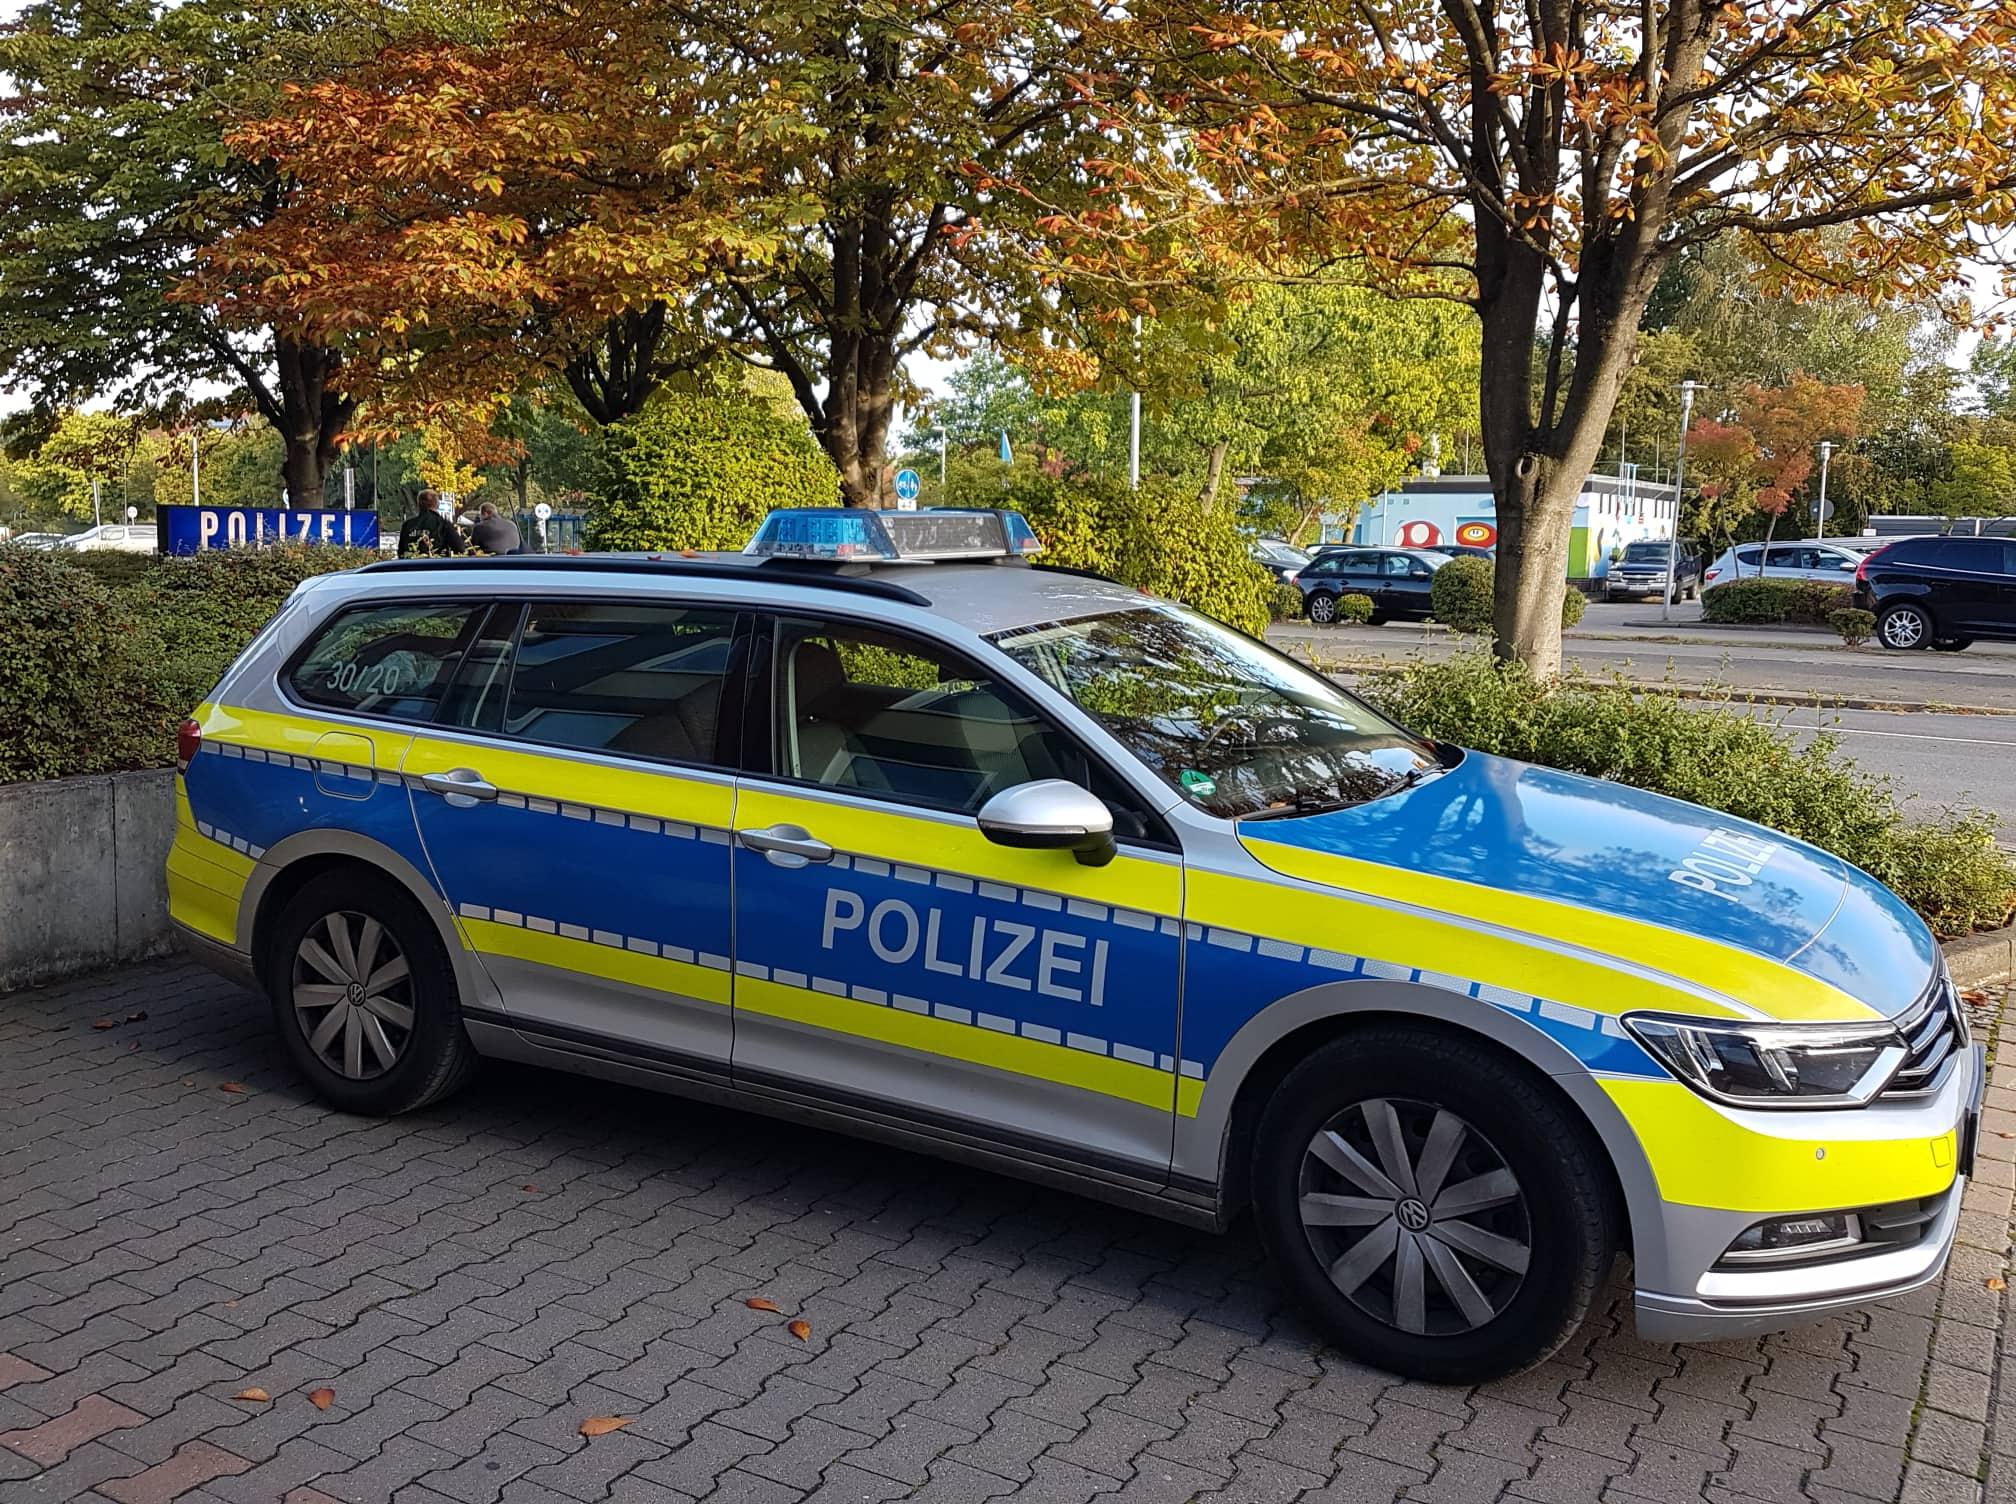 Sachbeschädigungen an zwei PKW am Wochenende - Wunstorf City News